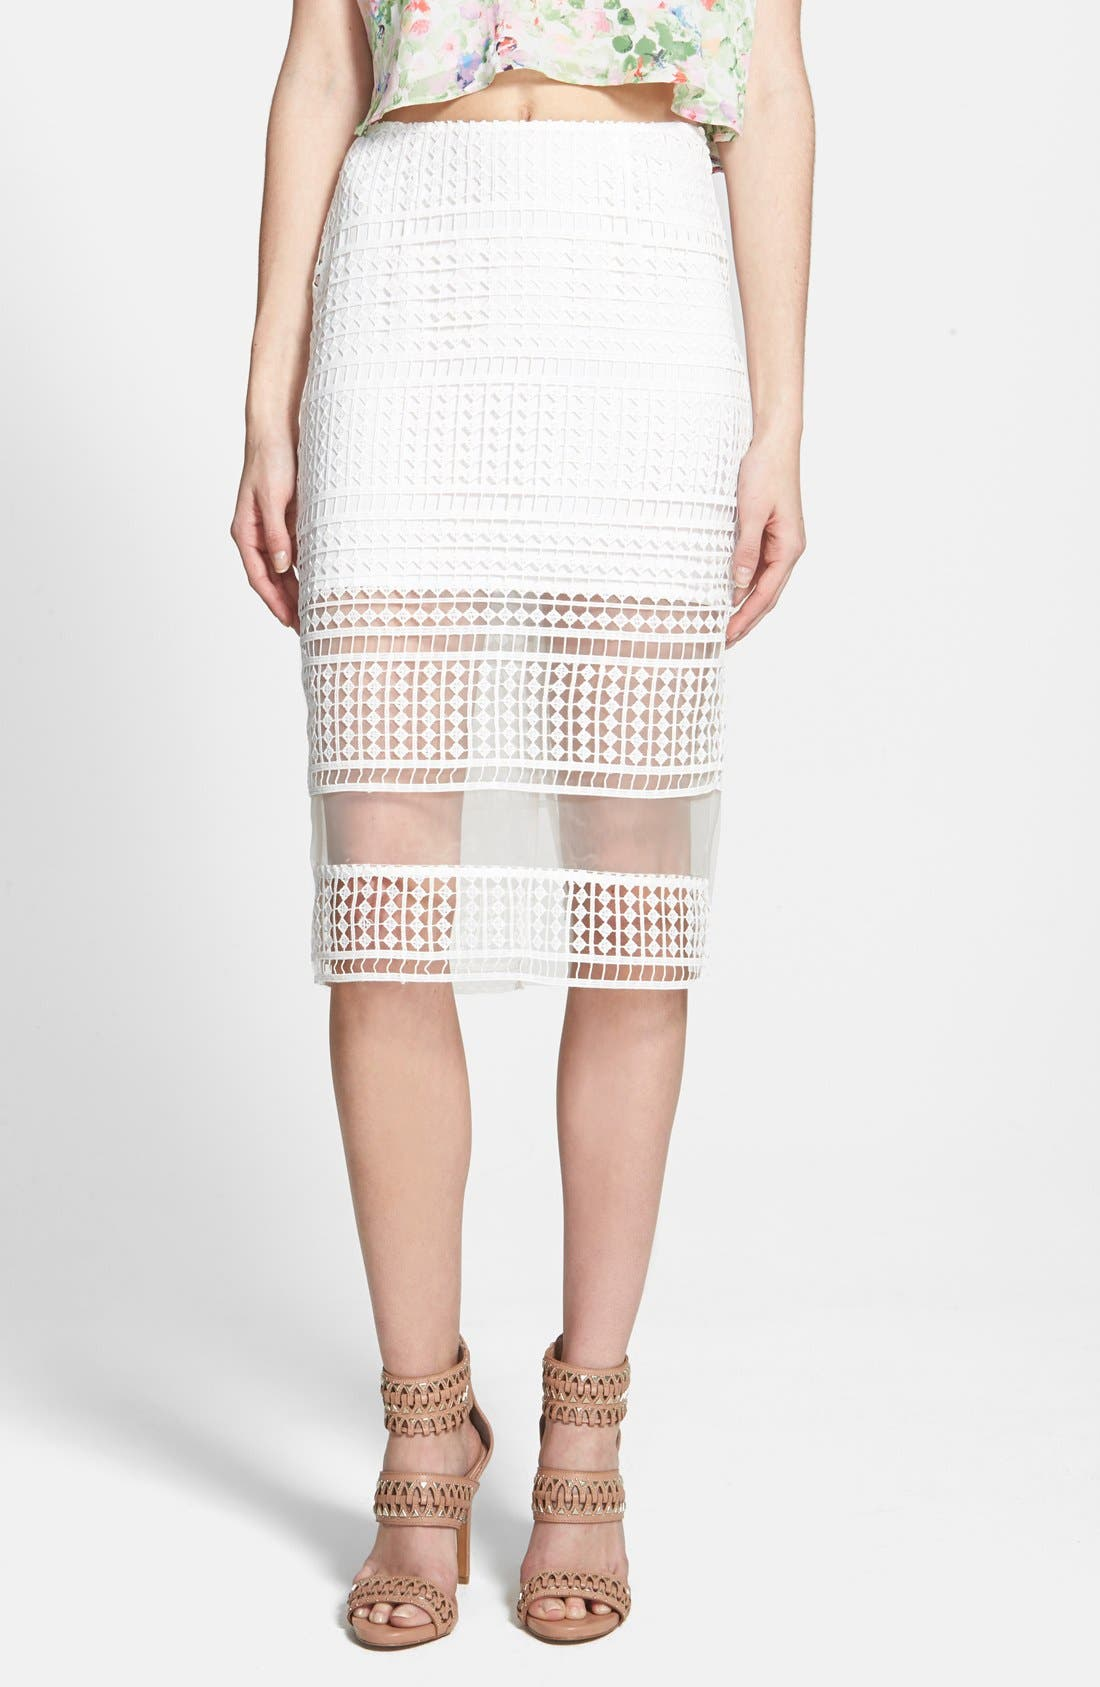 J.O.A., Lace Overlay Pencil Skirt, Main thumbnail 1, color, 900